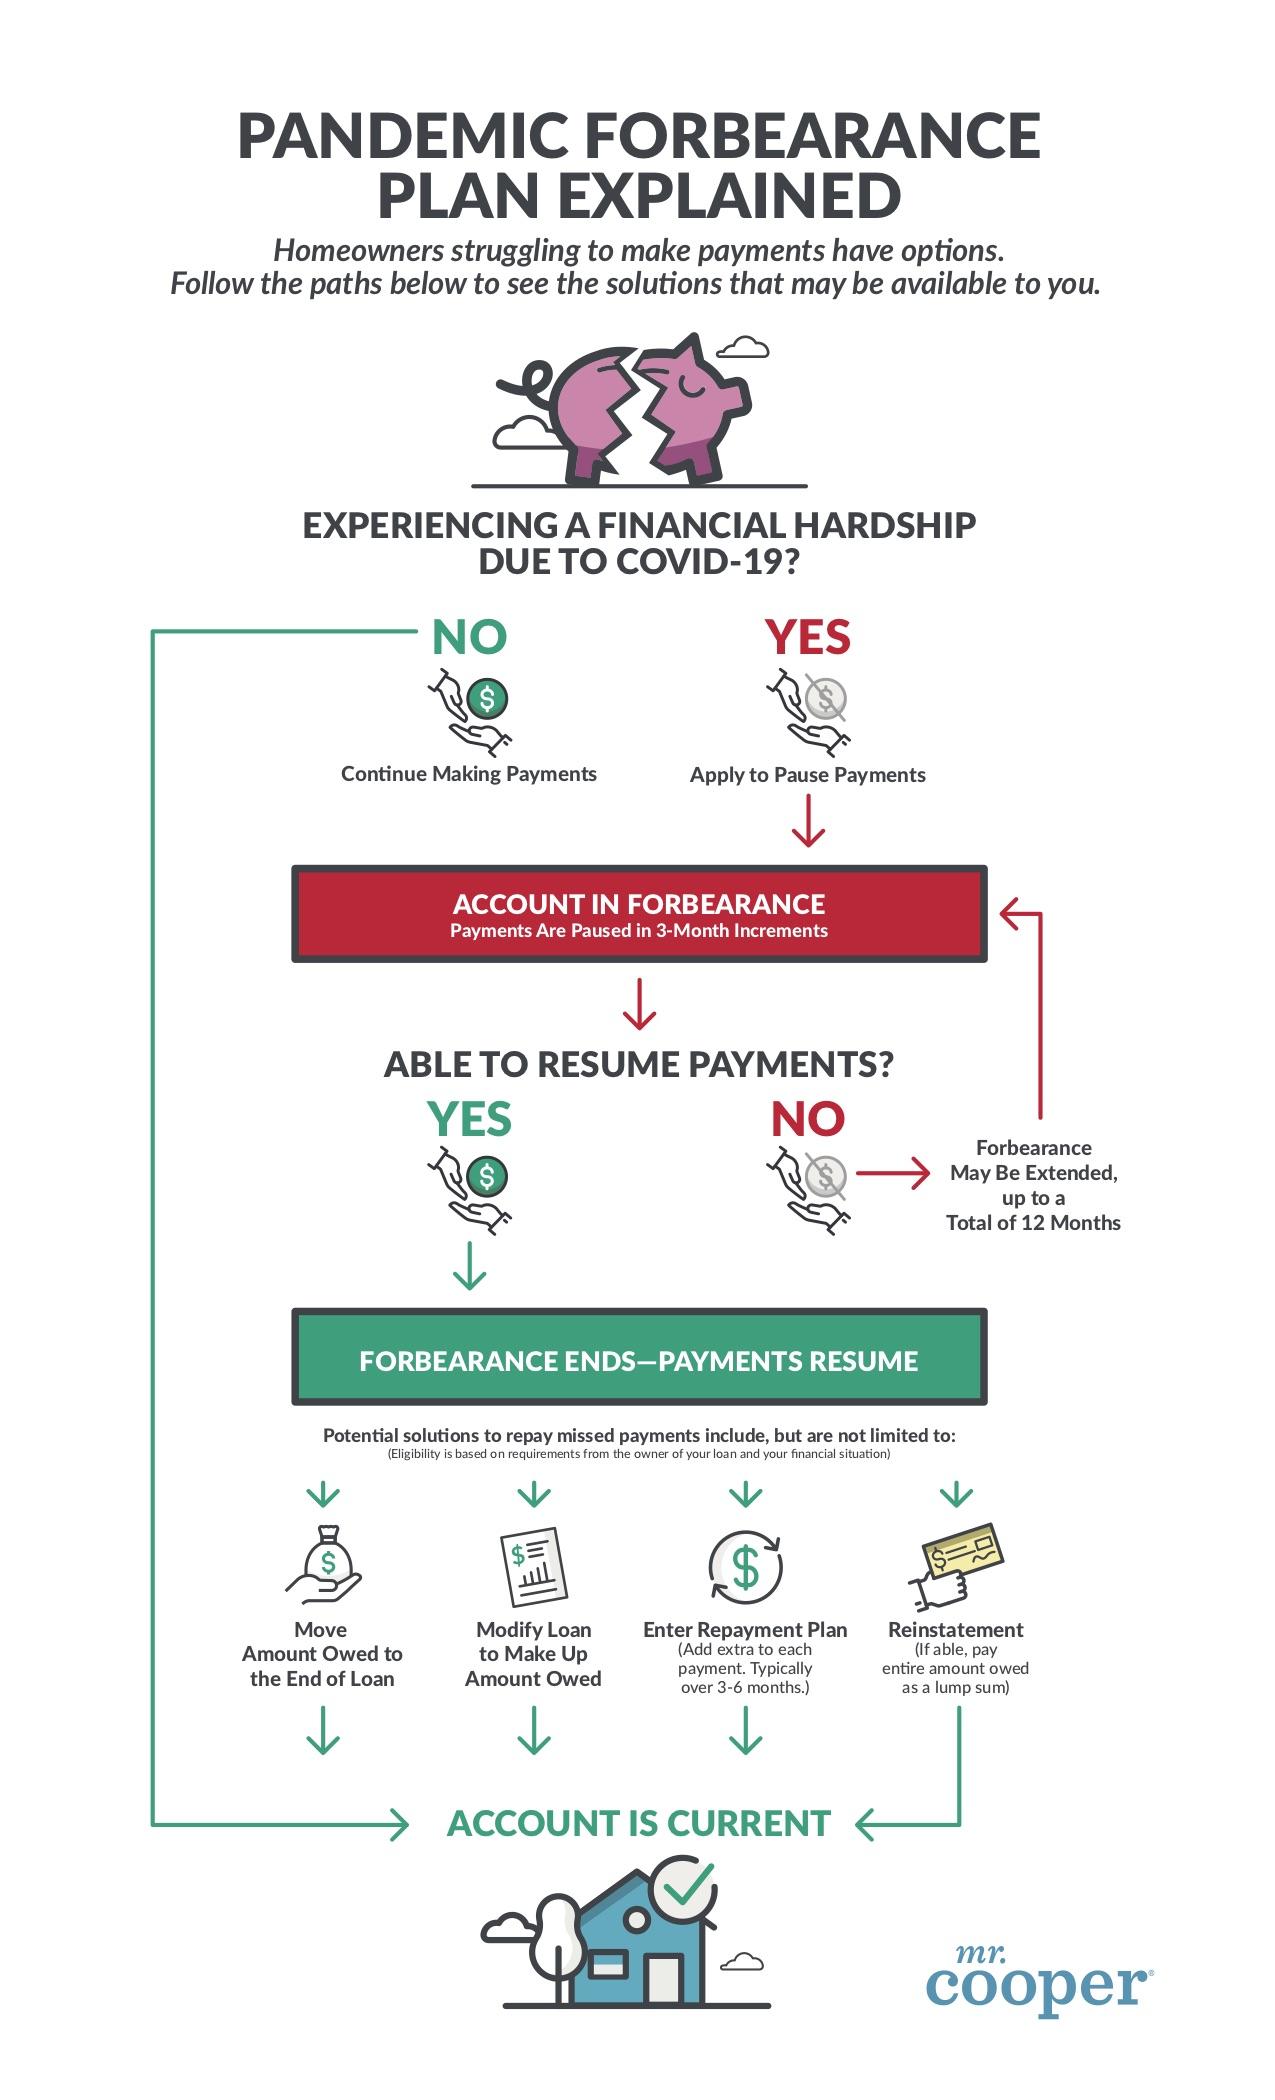 Forbearance Plan Infographic